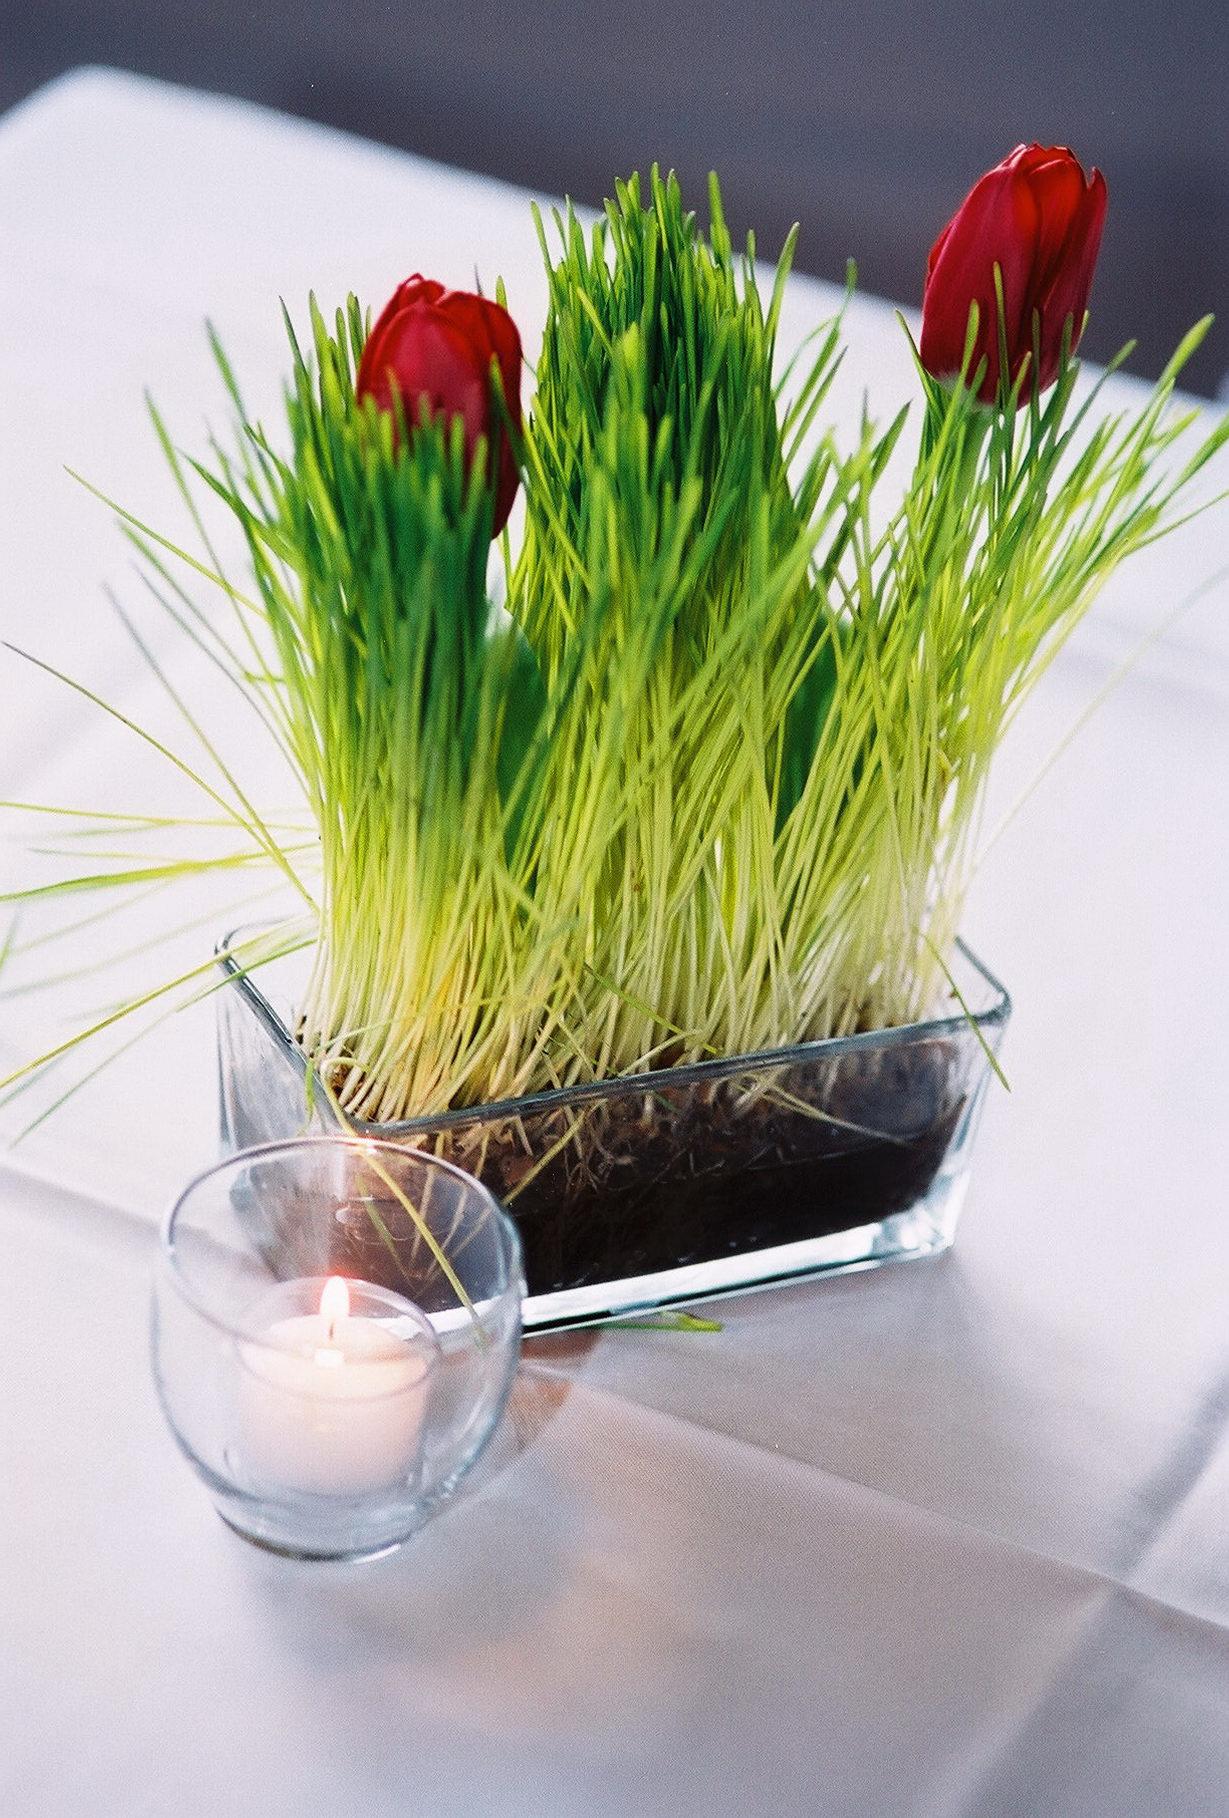 Red Tulip Wheat Grass Centerpiece